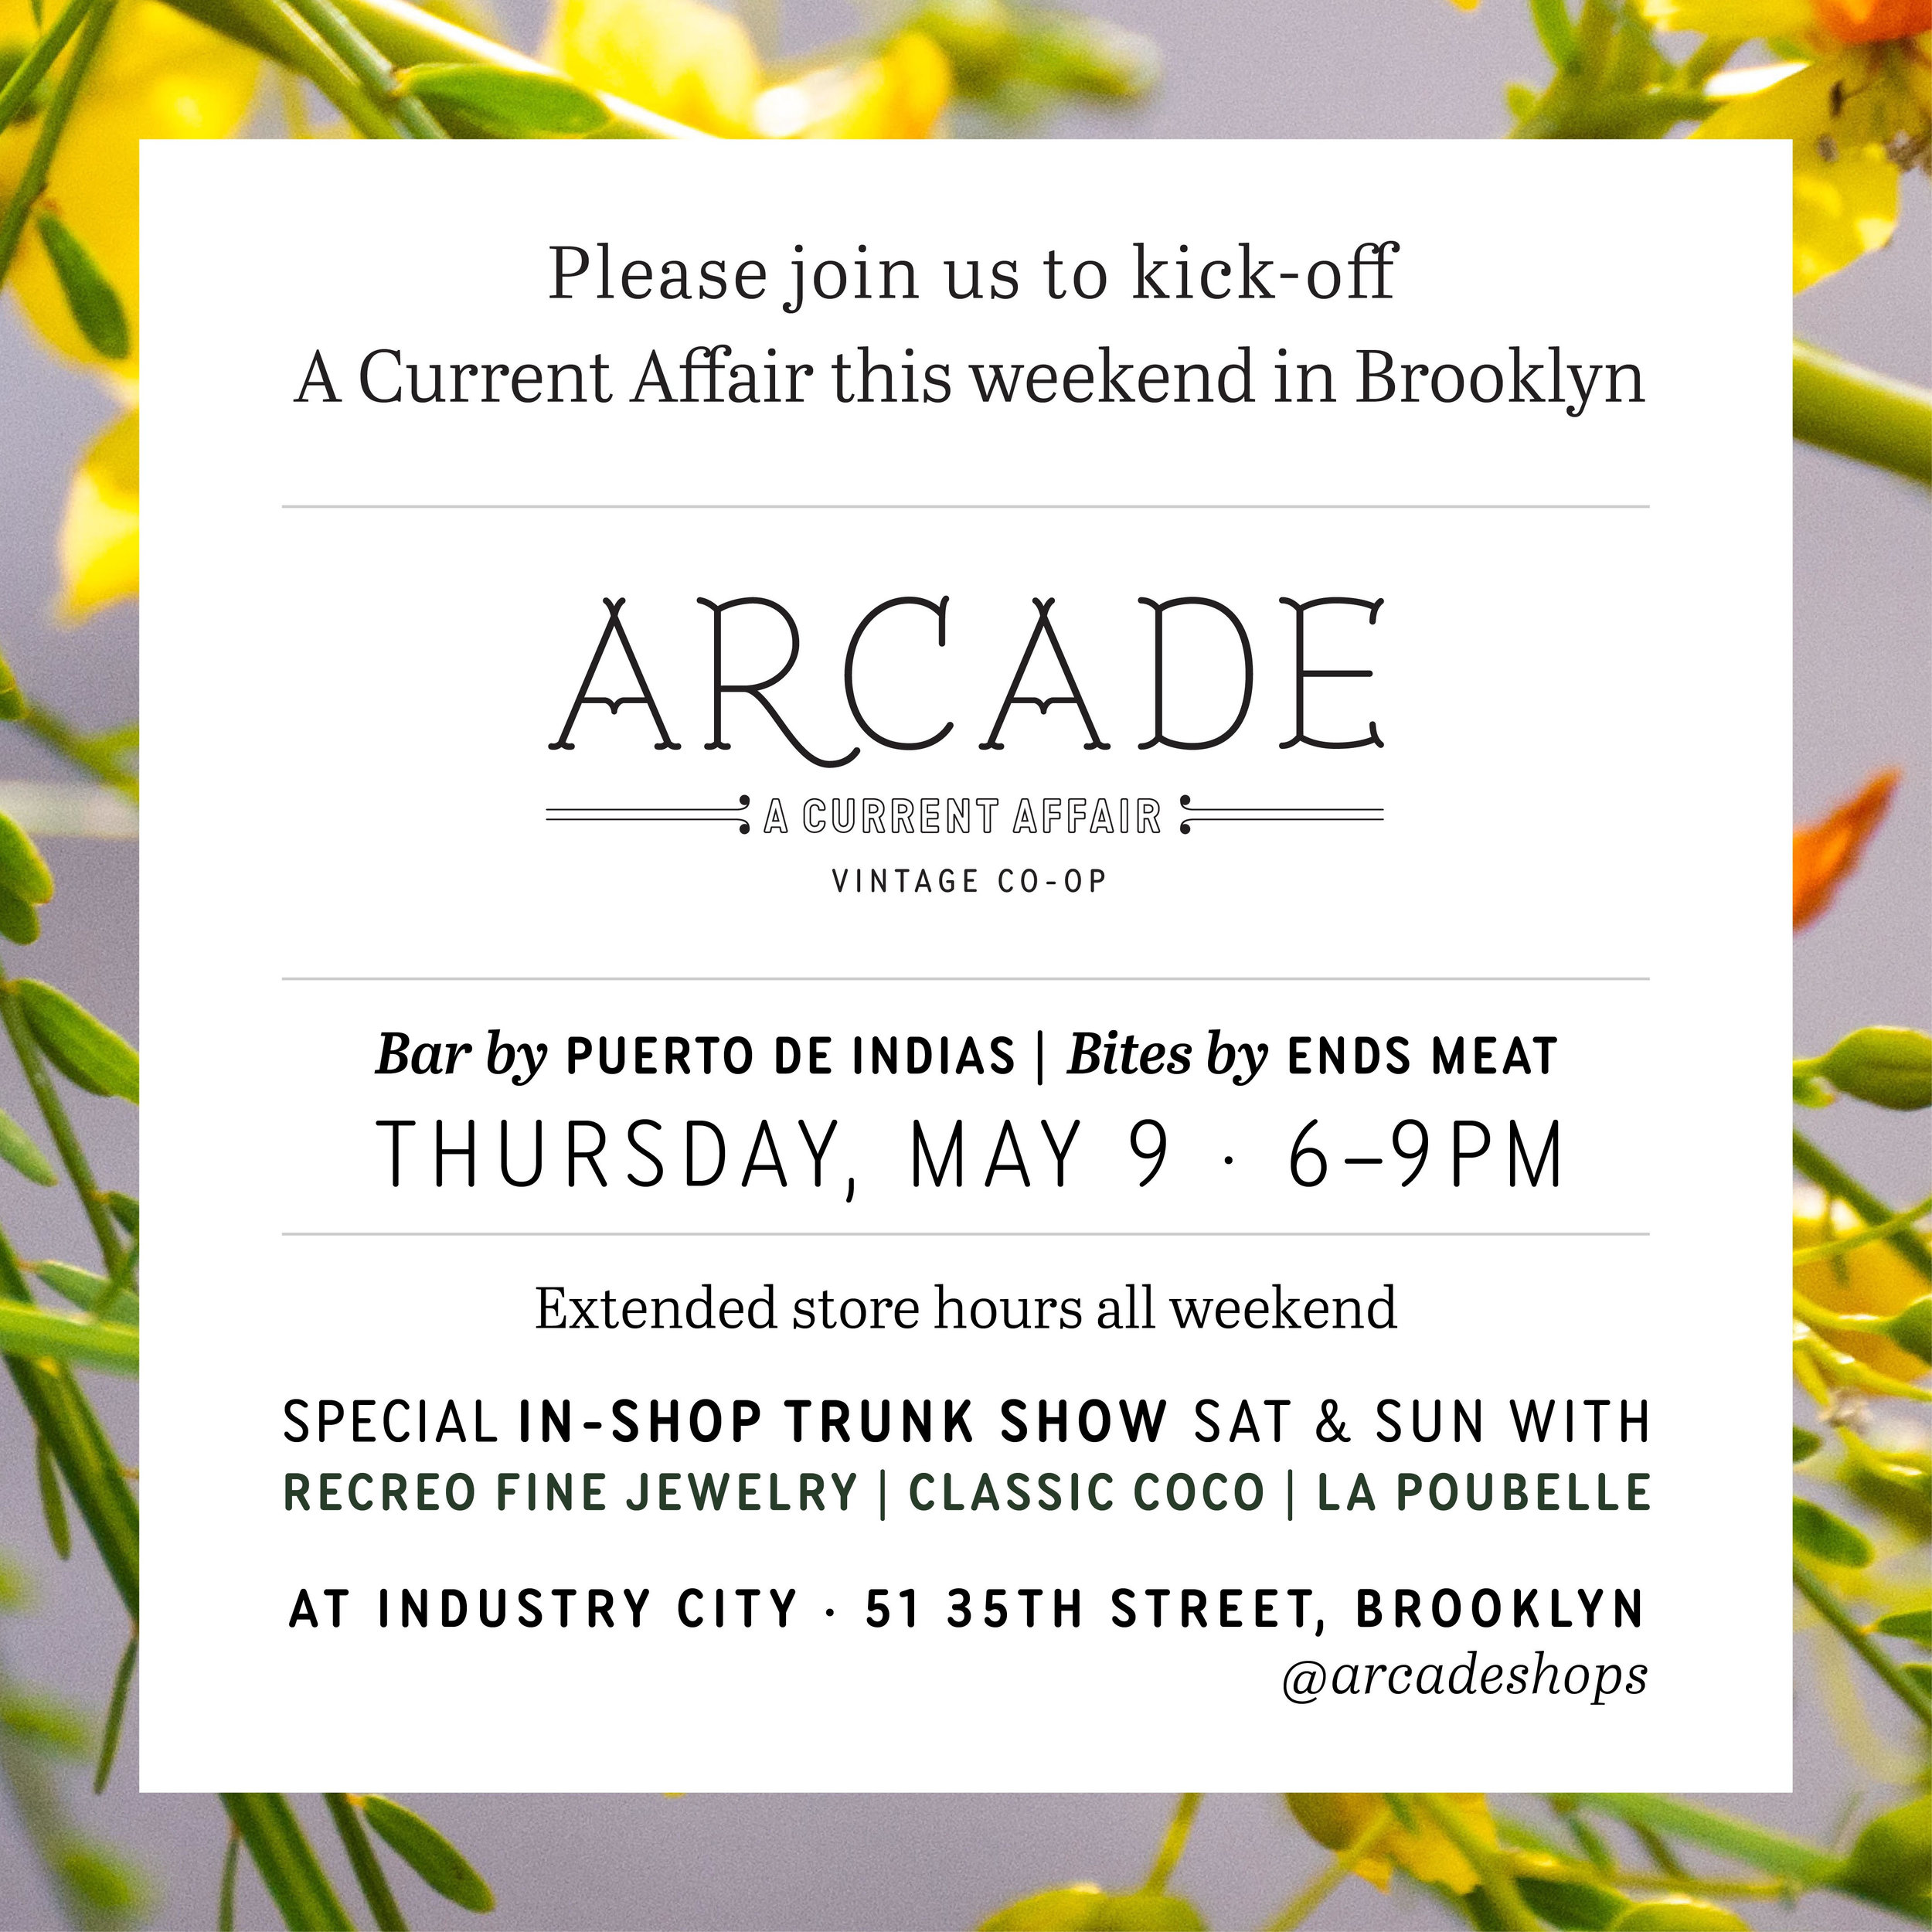 arcade invite.jpg